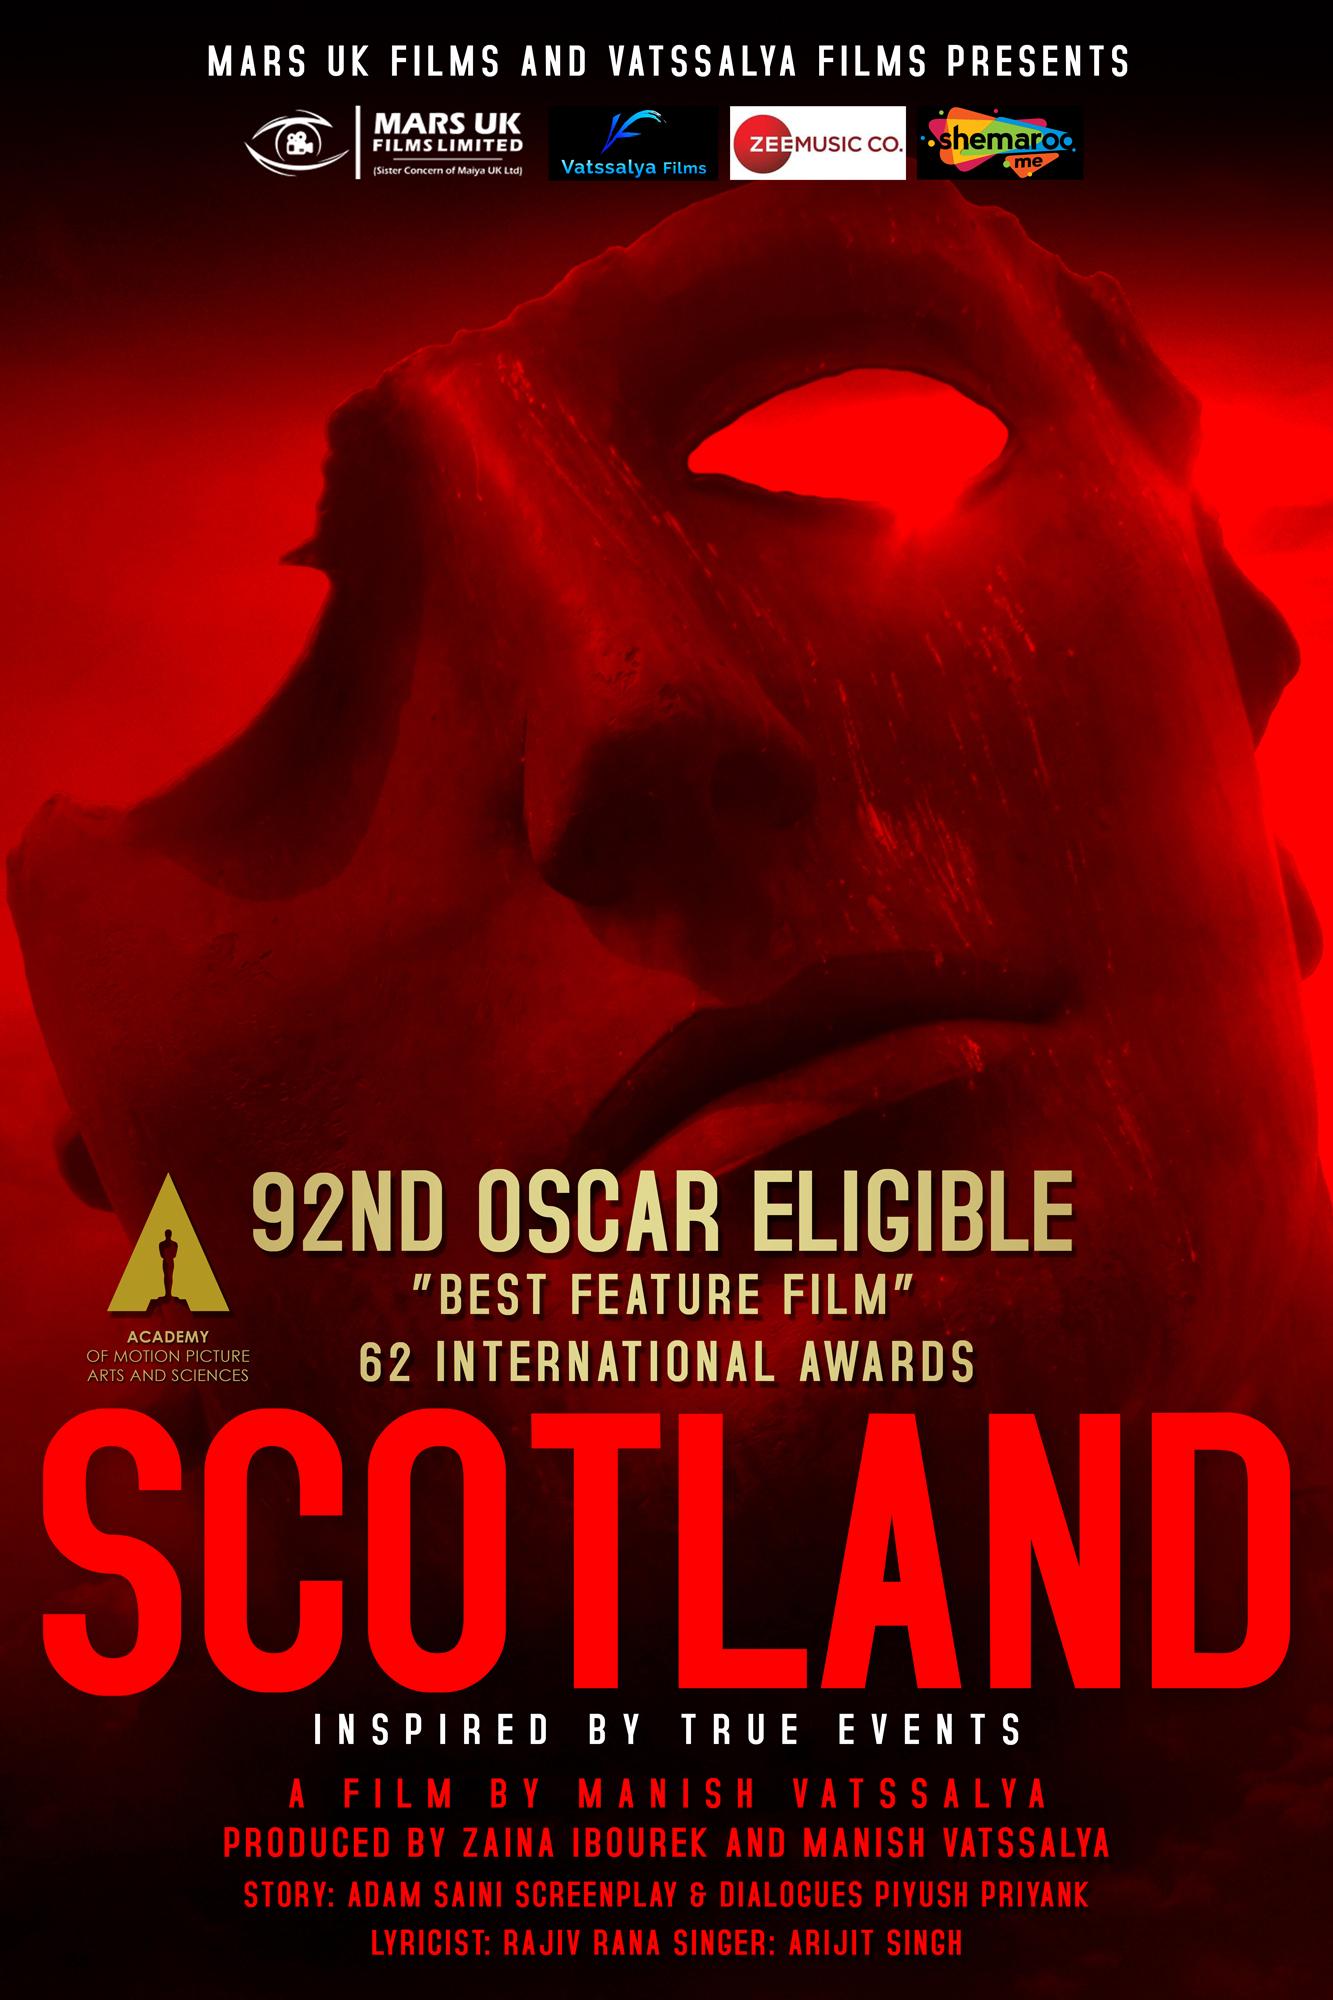 Scotland-Poster-Final-w-Shemaroo